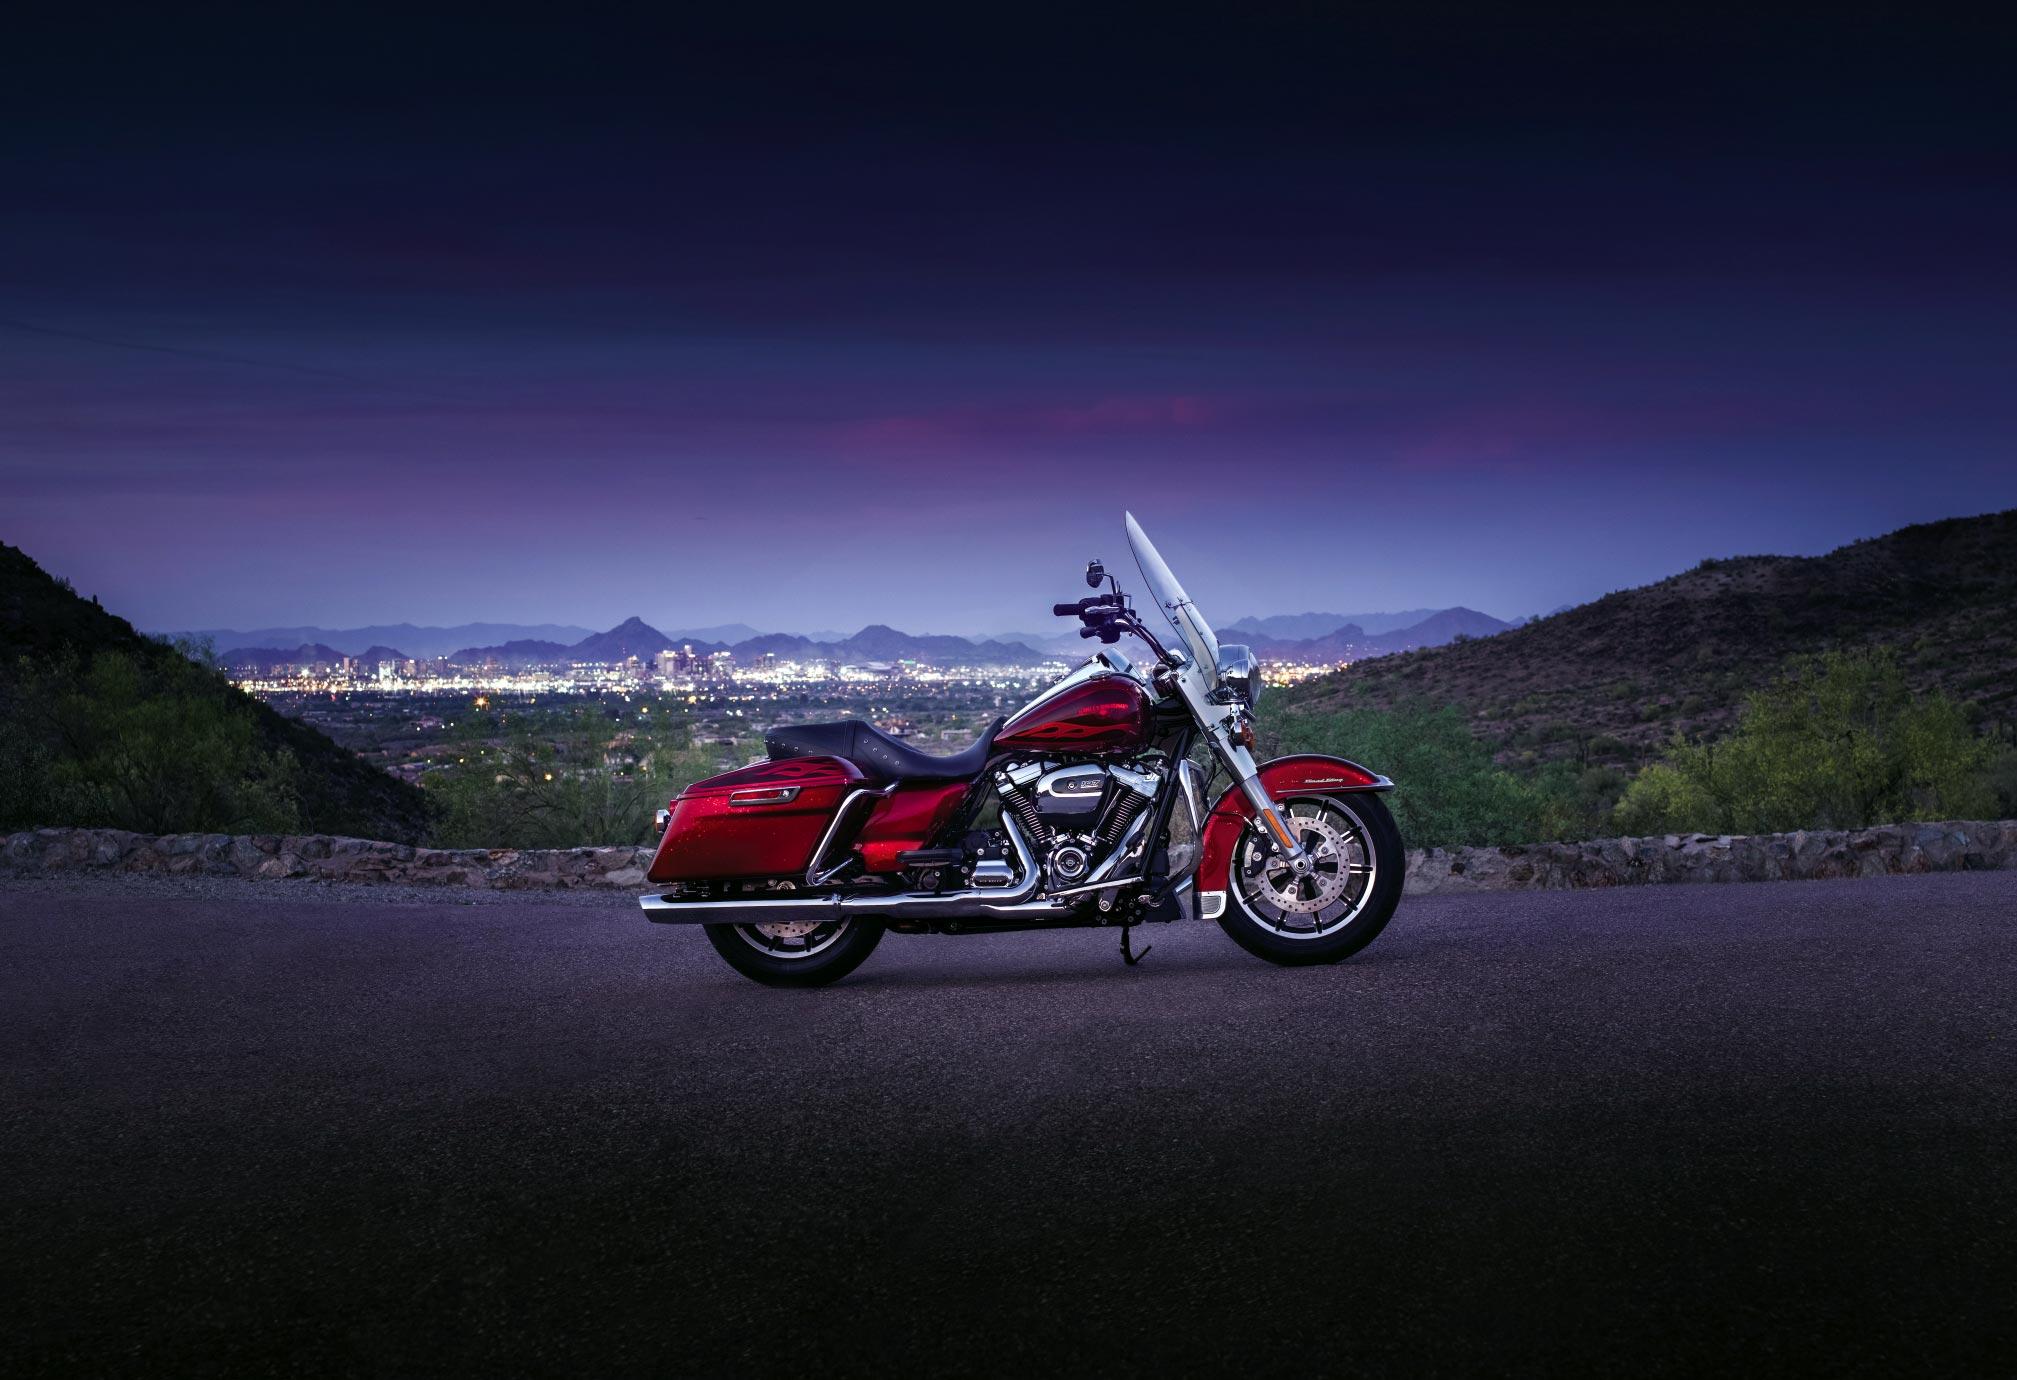 2017 Harley Davidson Road King Hd Wallpaper Background